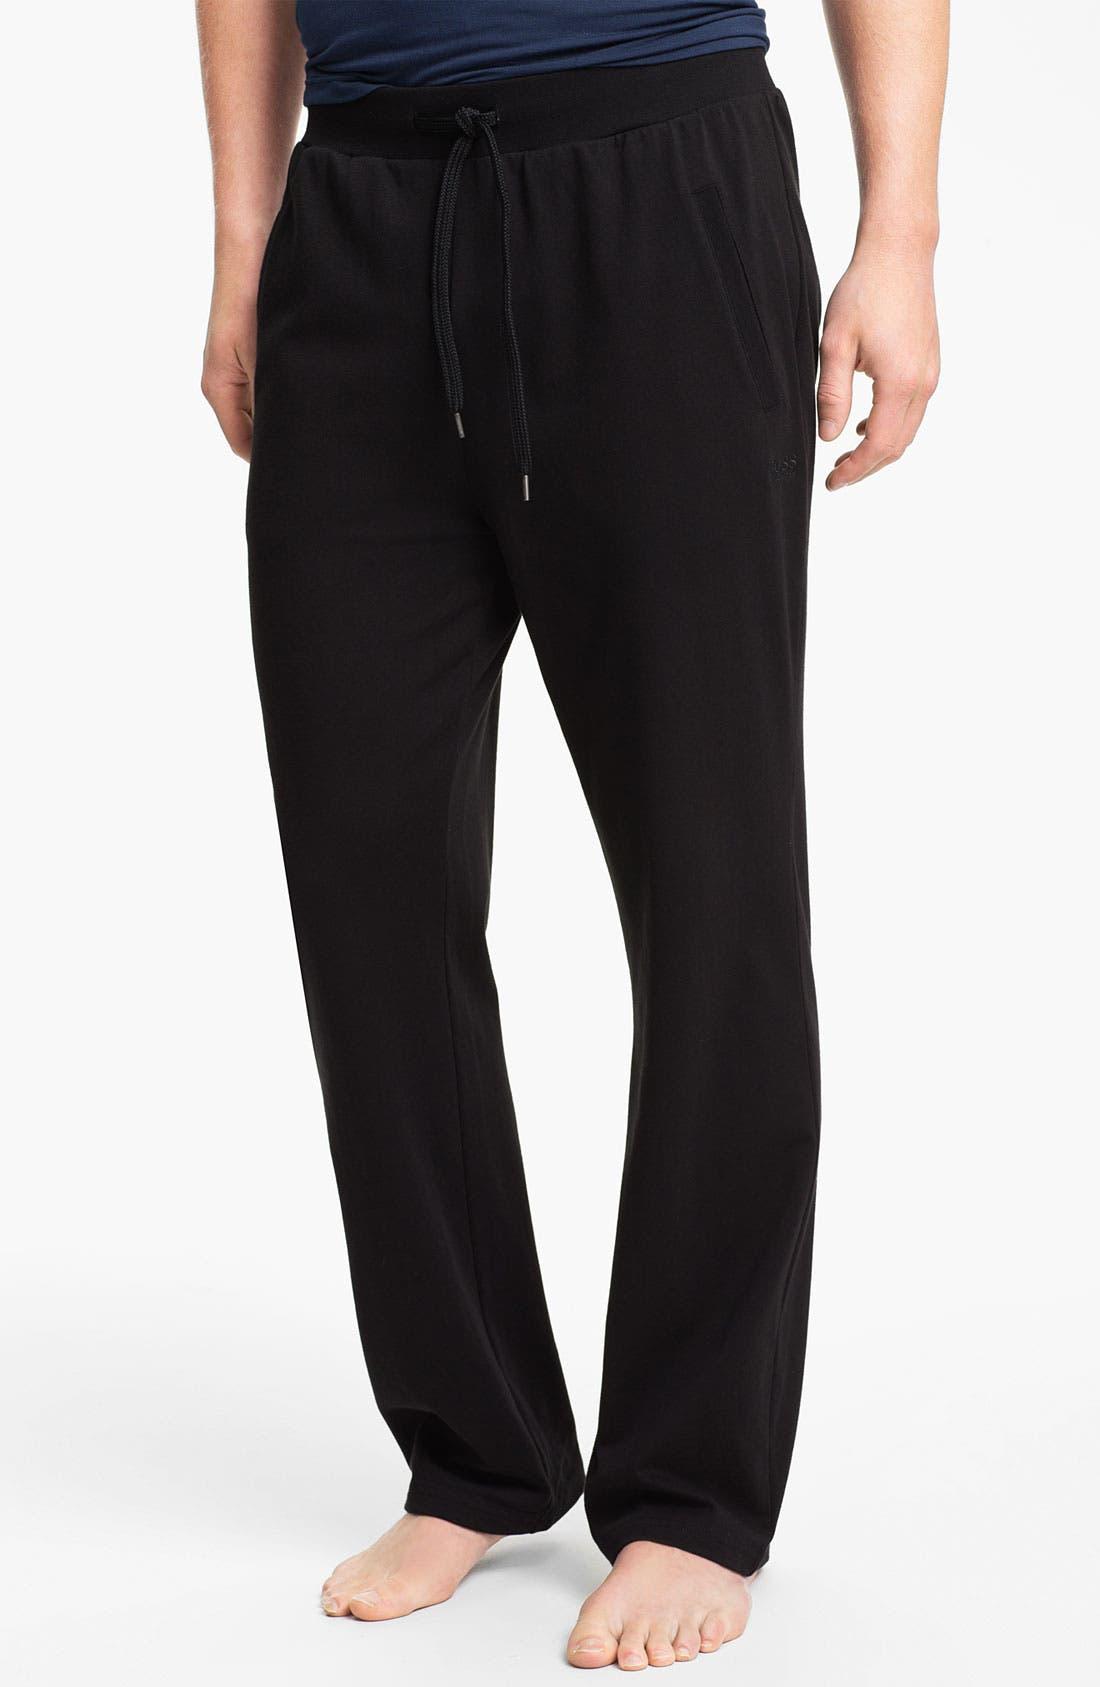 Alternate Image 1 Selected - BOSS Black 'Innovation 3' Lounge Pants